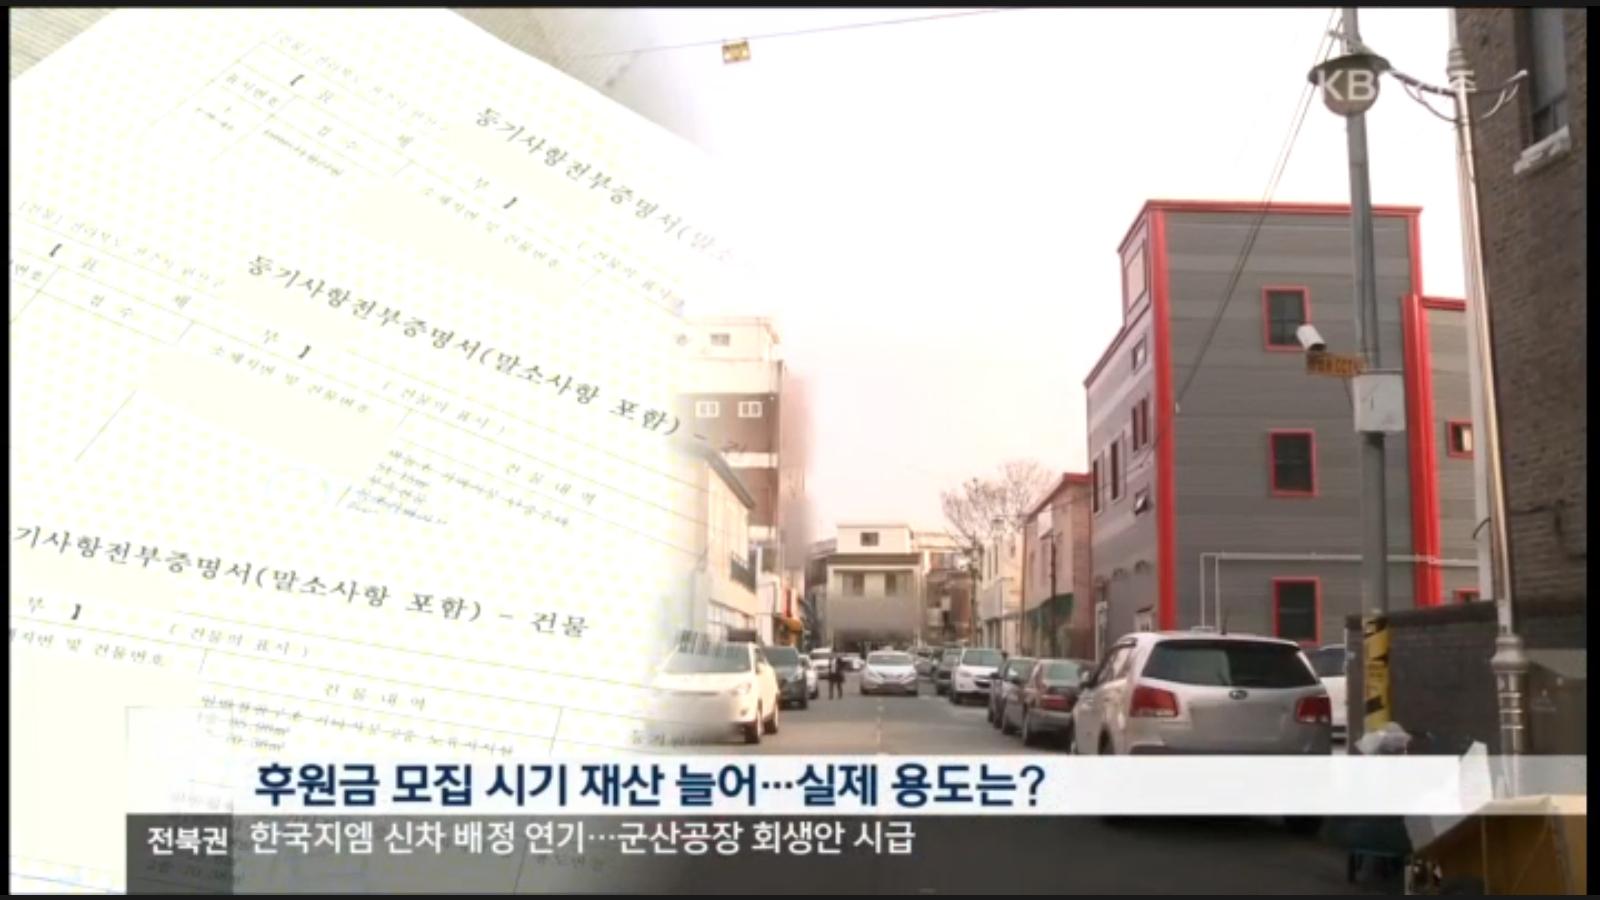 [18.3.30 KBS전주] 전주 봉침게이트, 재산 형성은..후원금검찰 사건축소..재수사 해야5.jpg